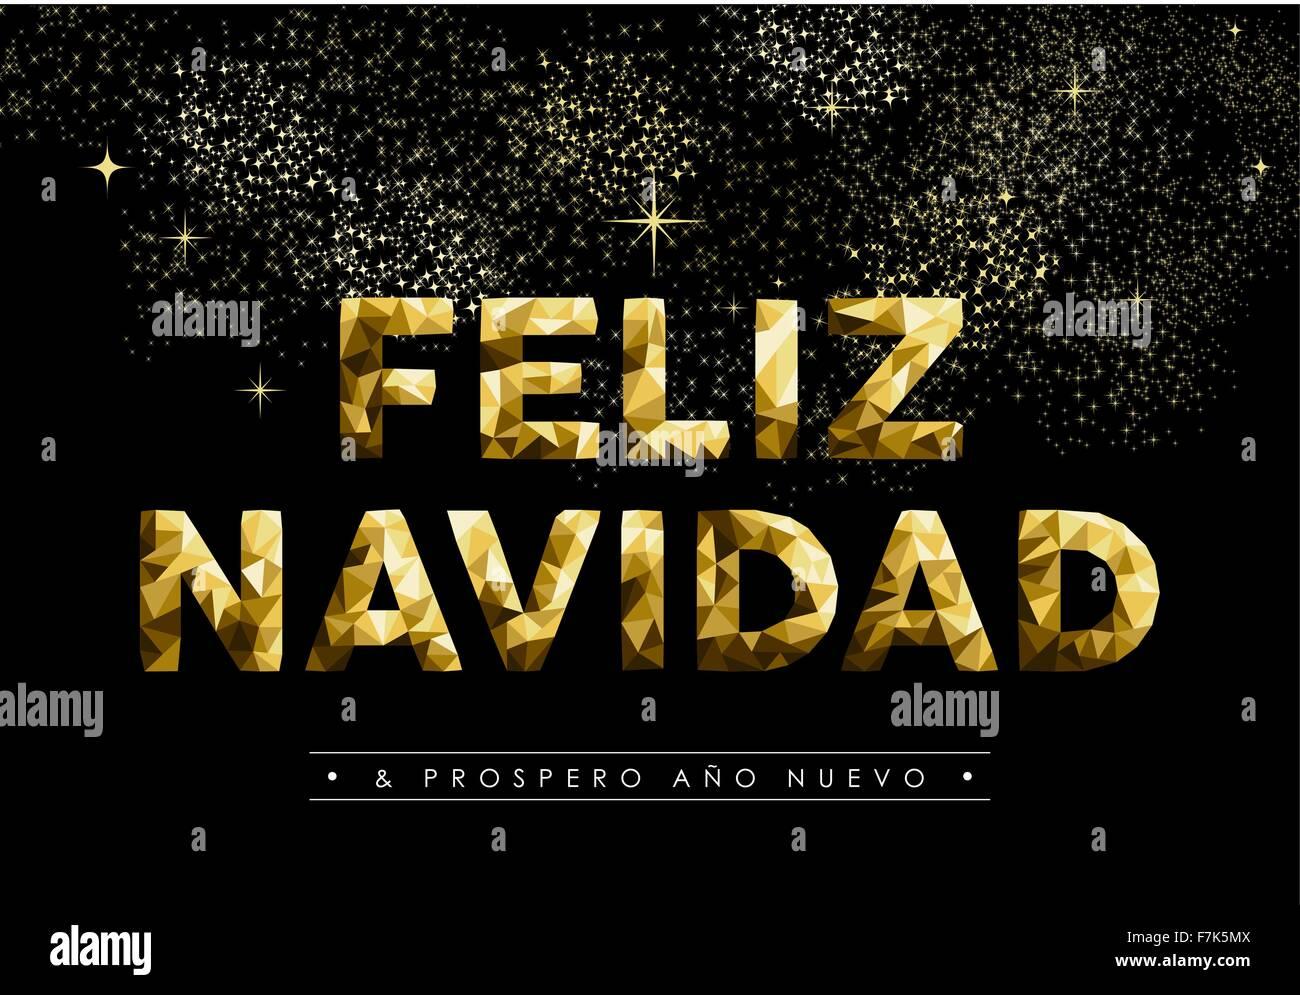 Merry Christmas Greeting Card In Spanish Language Feliz Navidad And